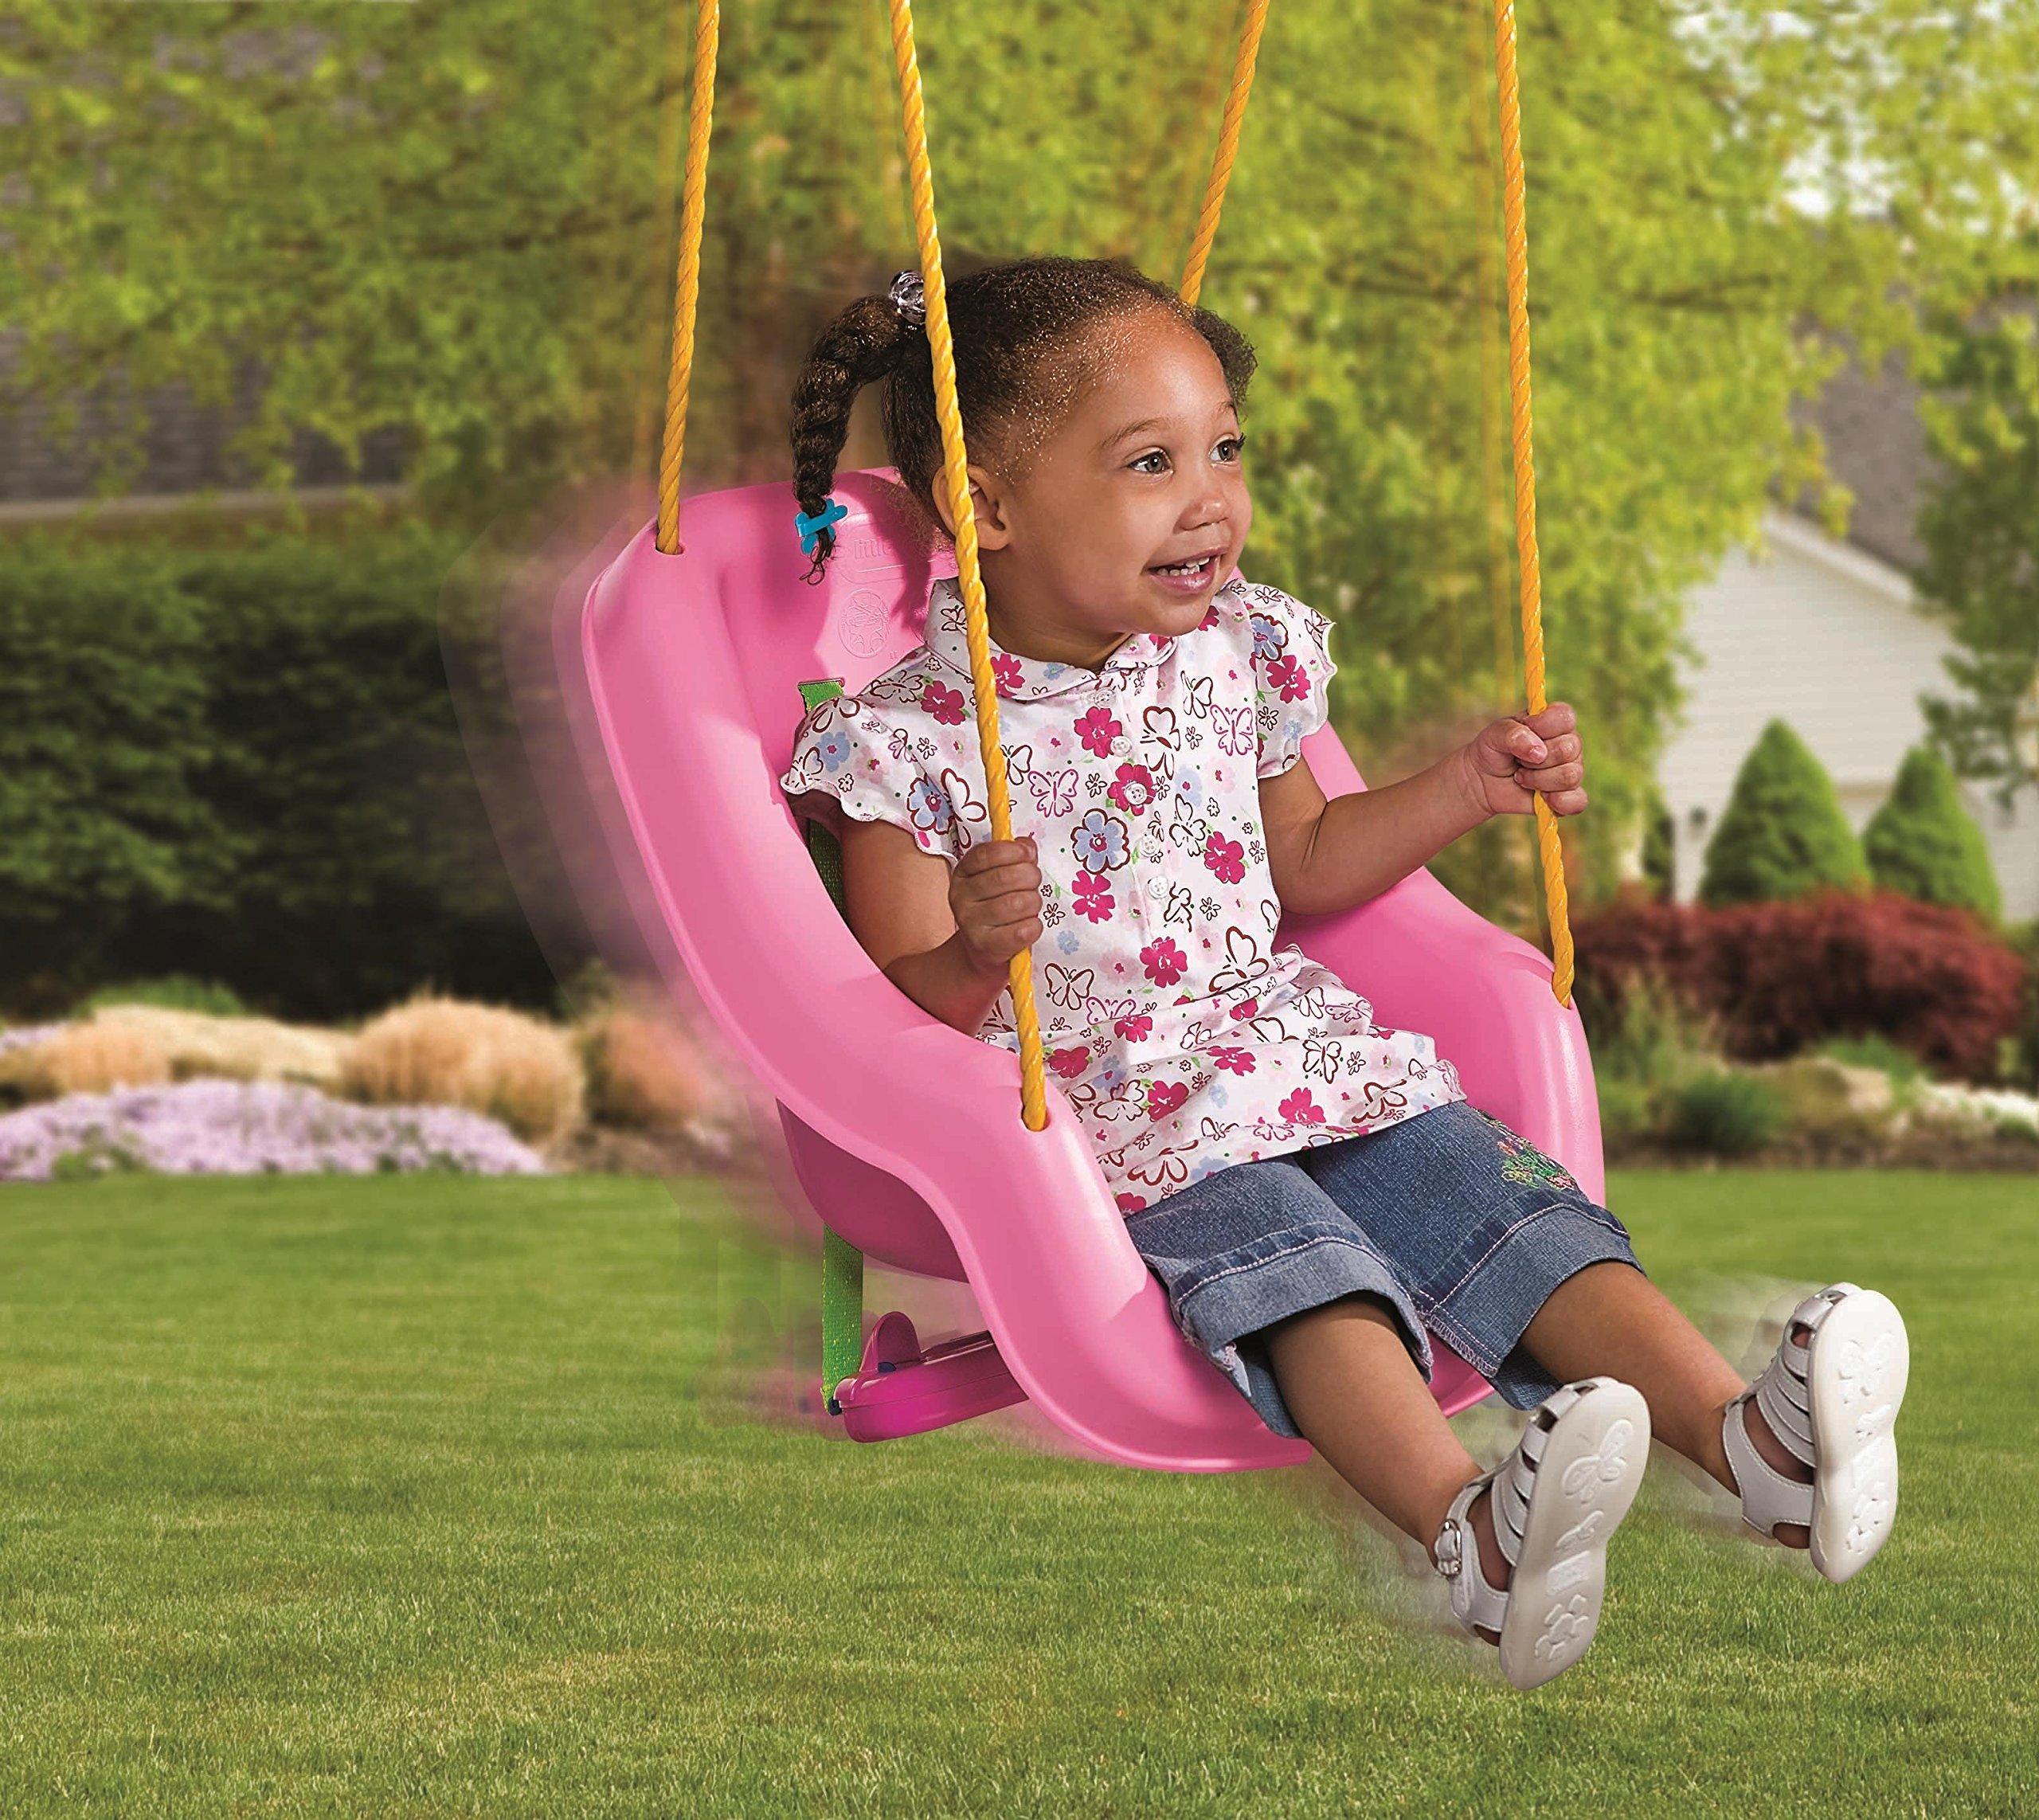 Little Tikes 2-in-1 Snug 'n Secure Swing, Pink by Little Tikes